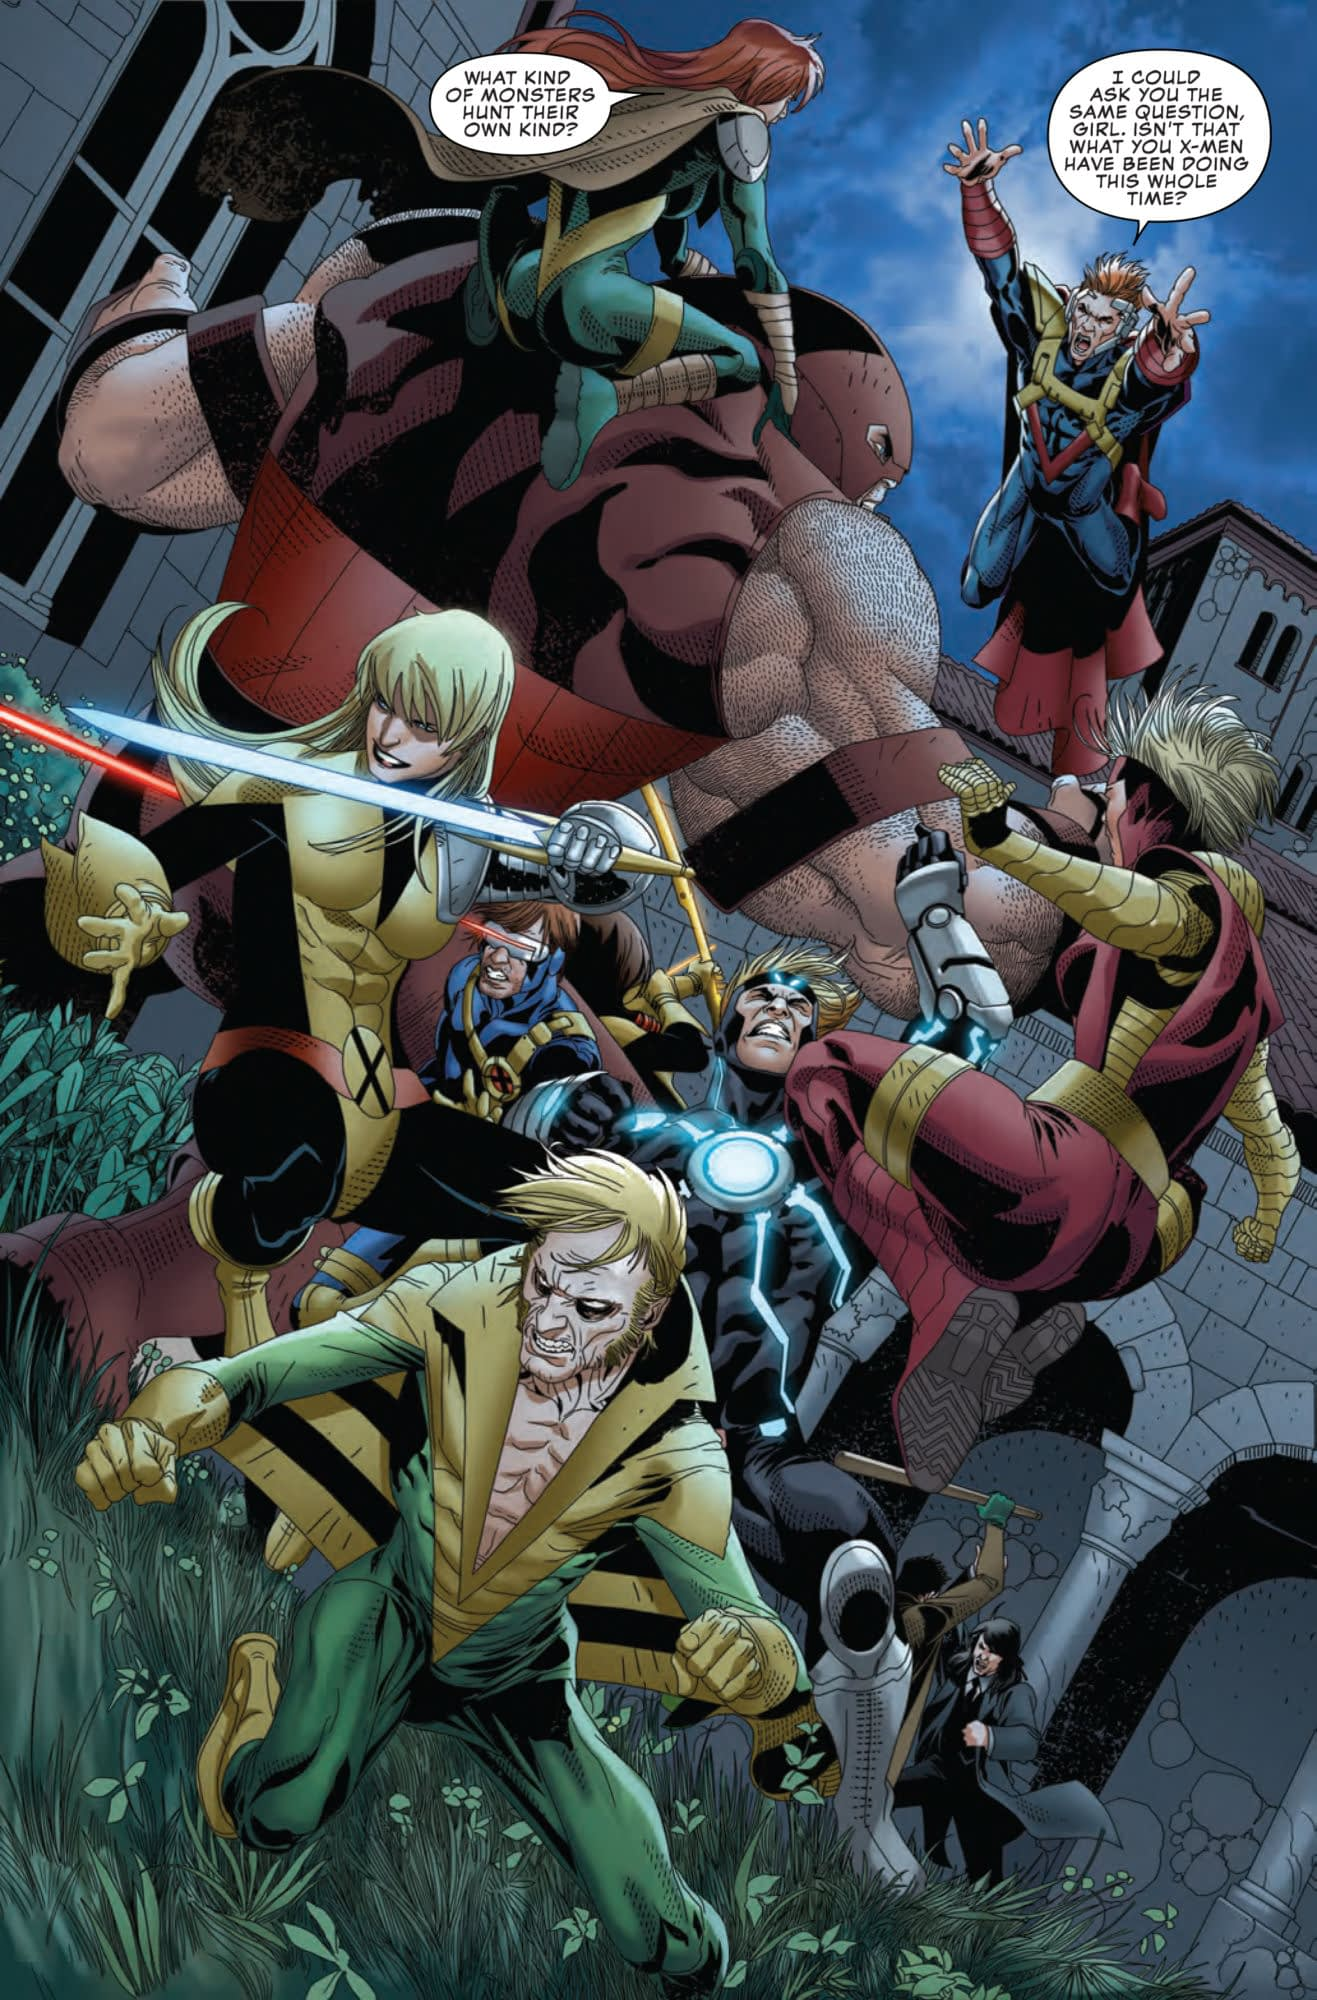 Uncanny X-Men #20 in Uncanny X-Men #20